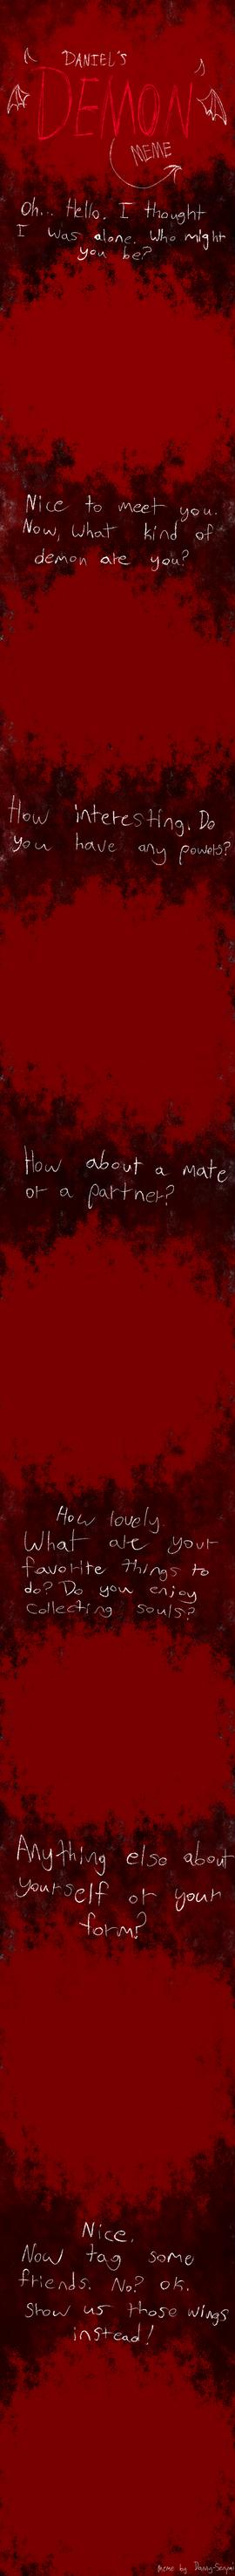 Demon OC Meme -Blank- by Pastel-Demon-Prince